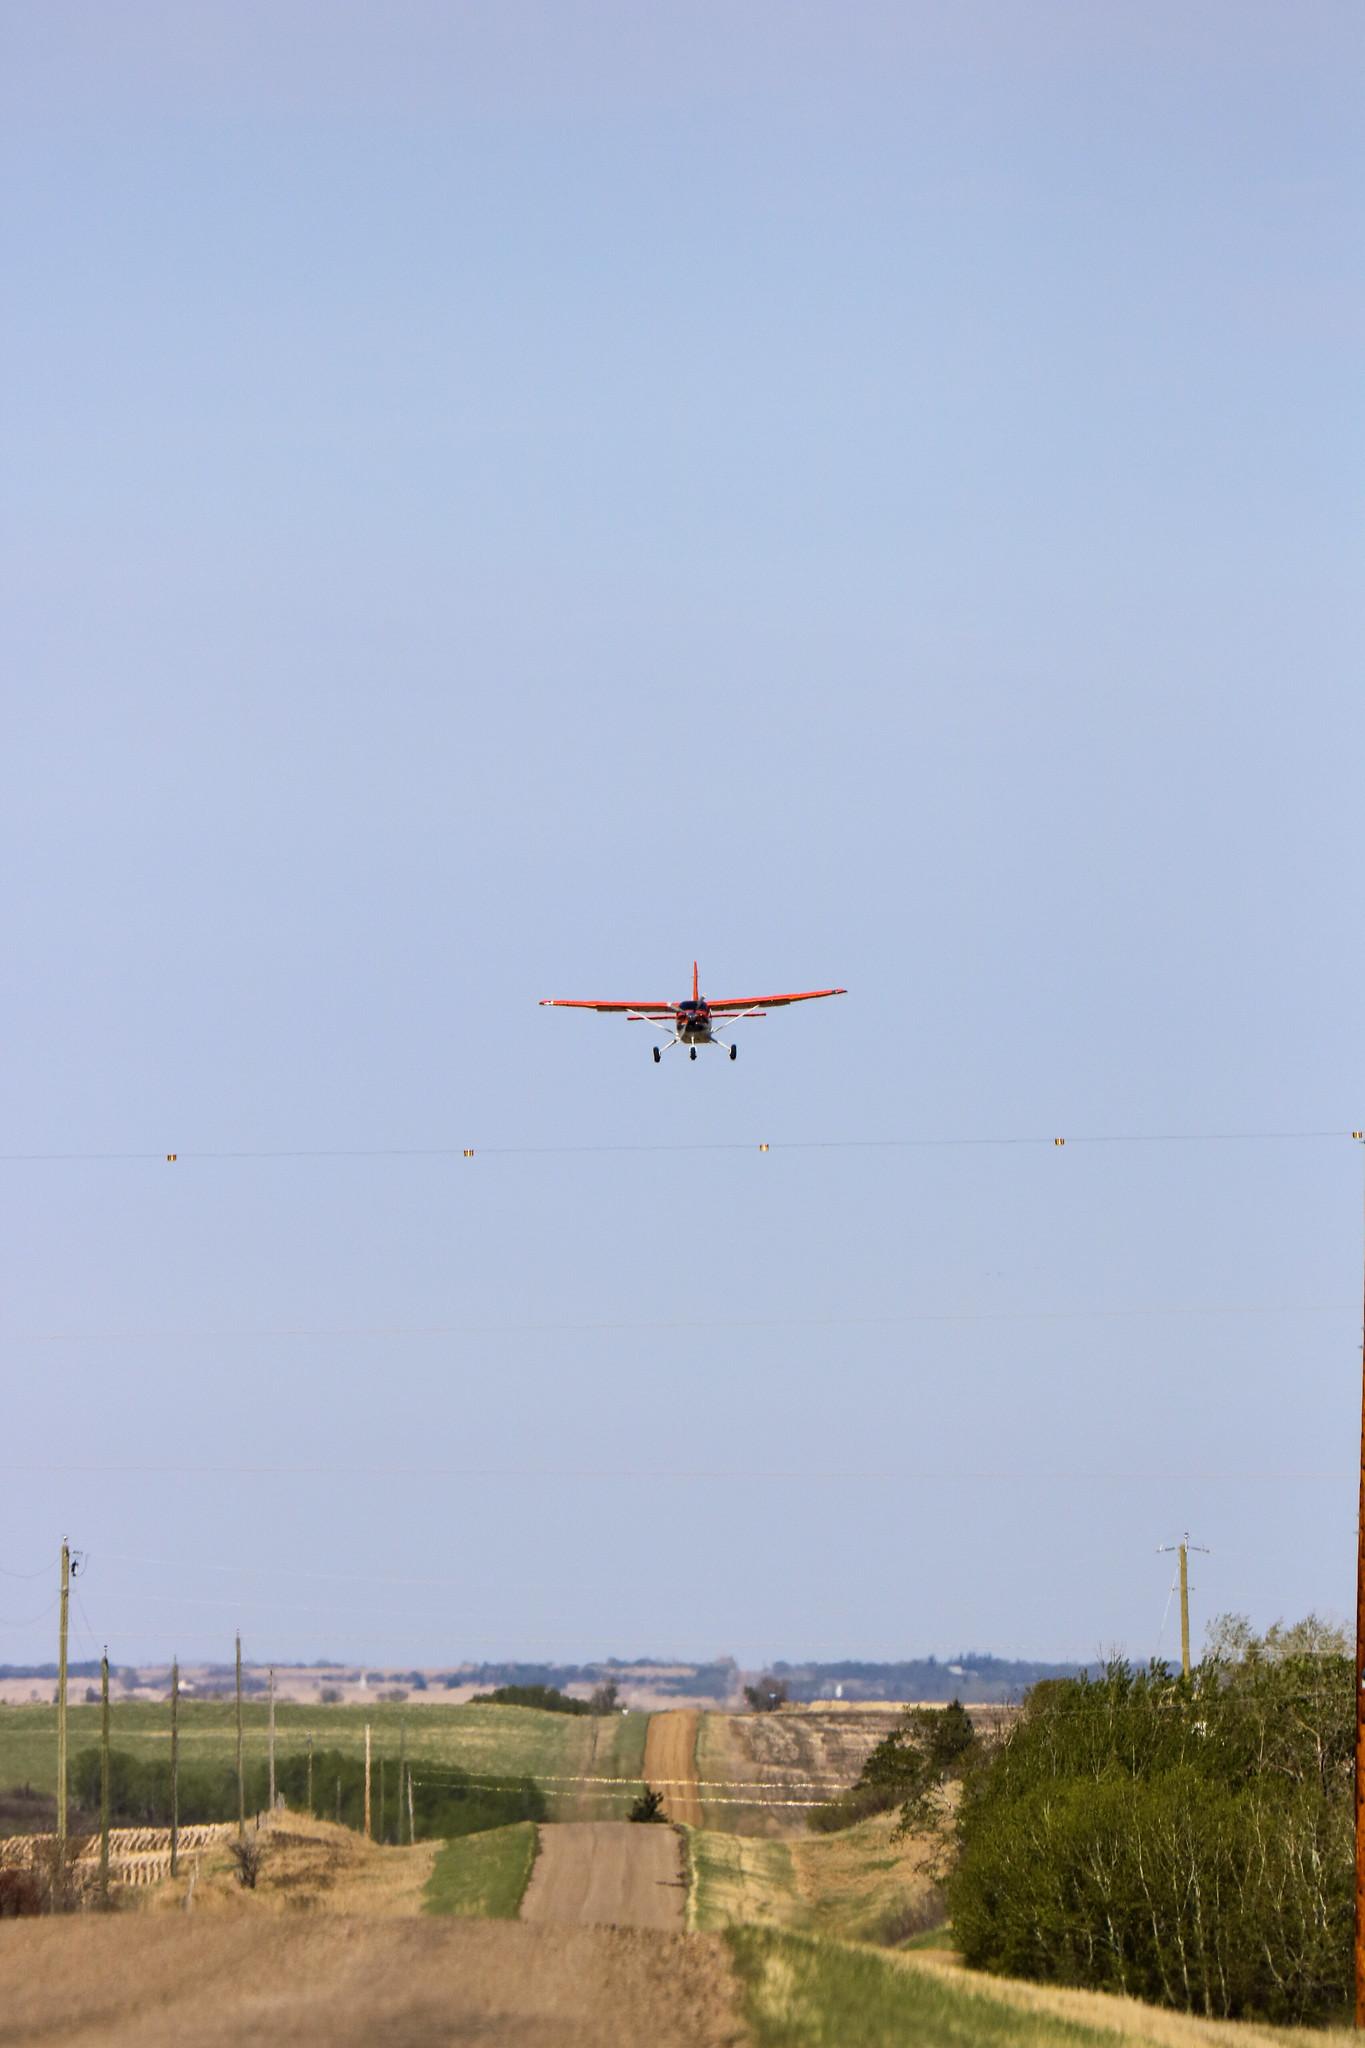 Spangler N710 flying over air ground segment. USFWS